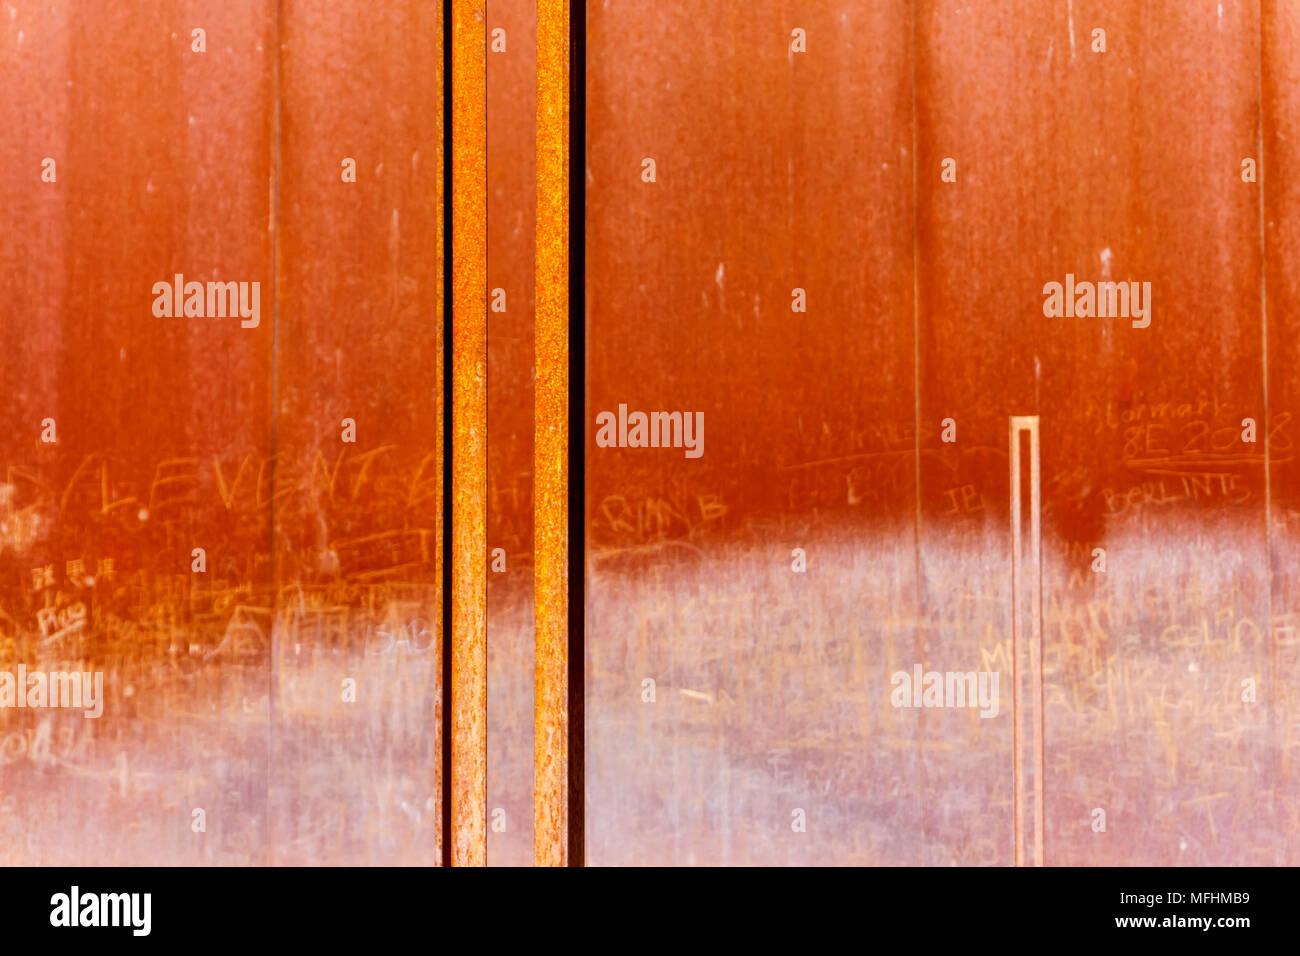 Rusty metal wall installation at Berlin Wall Memorial Park - Stock Image